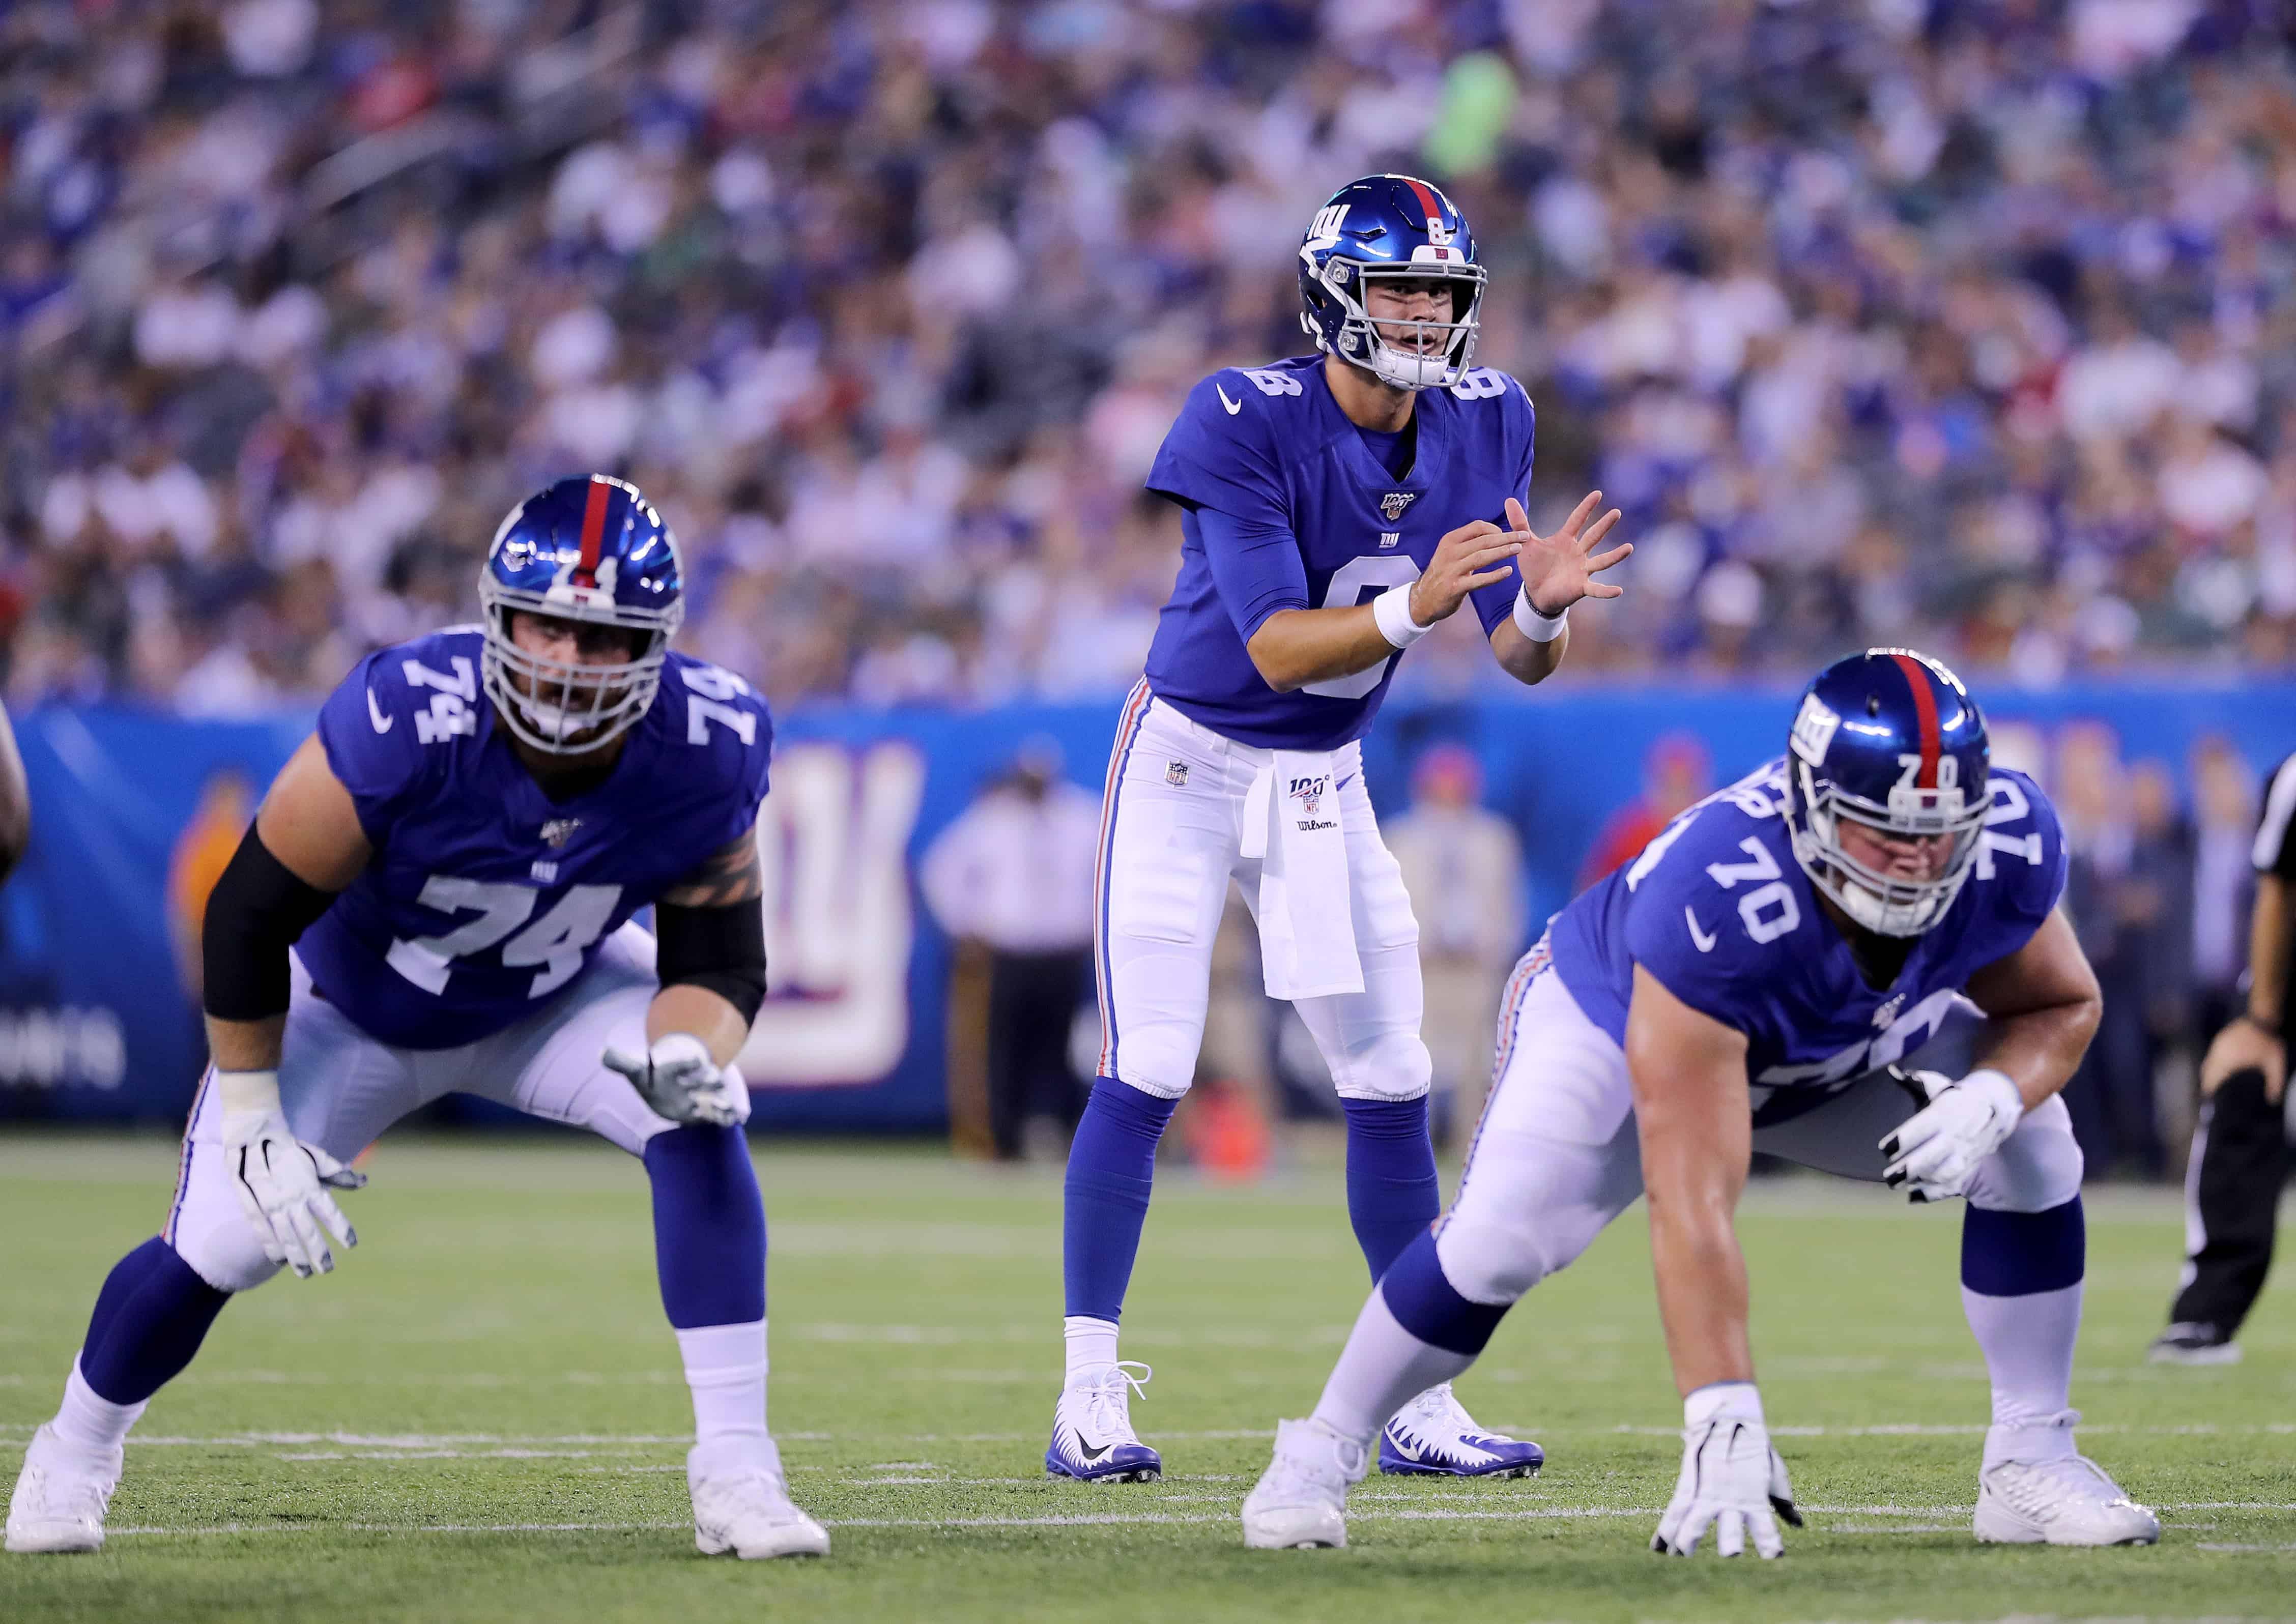 QB Daniel Jones New York Giants takes a snap